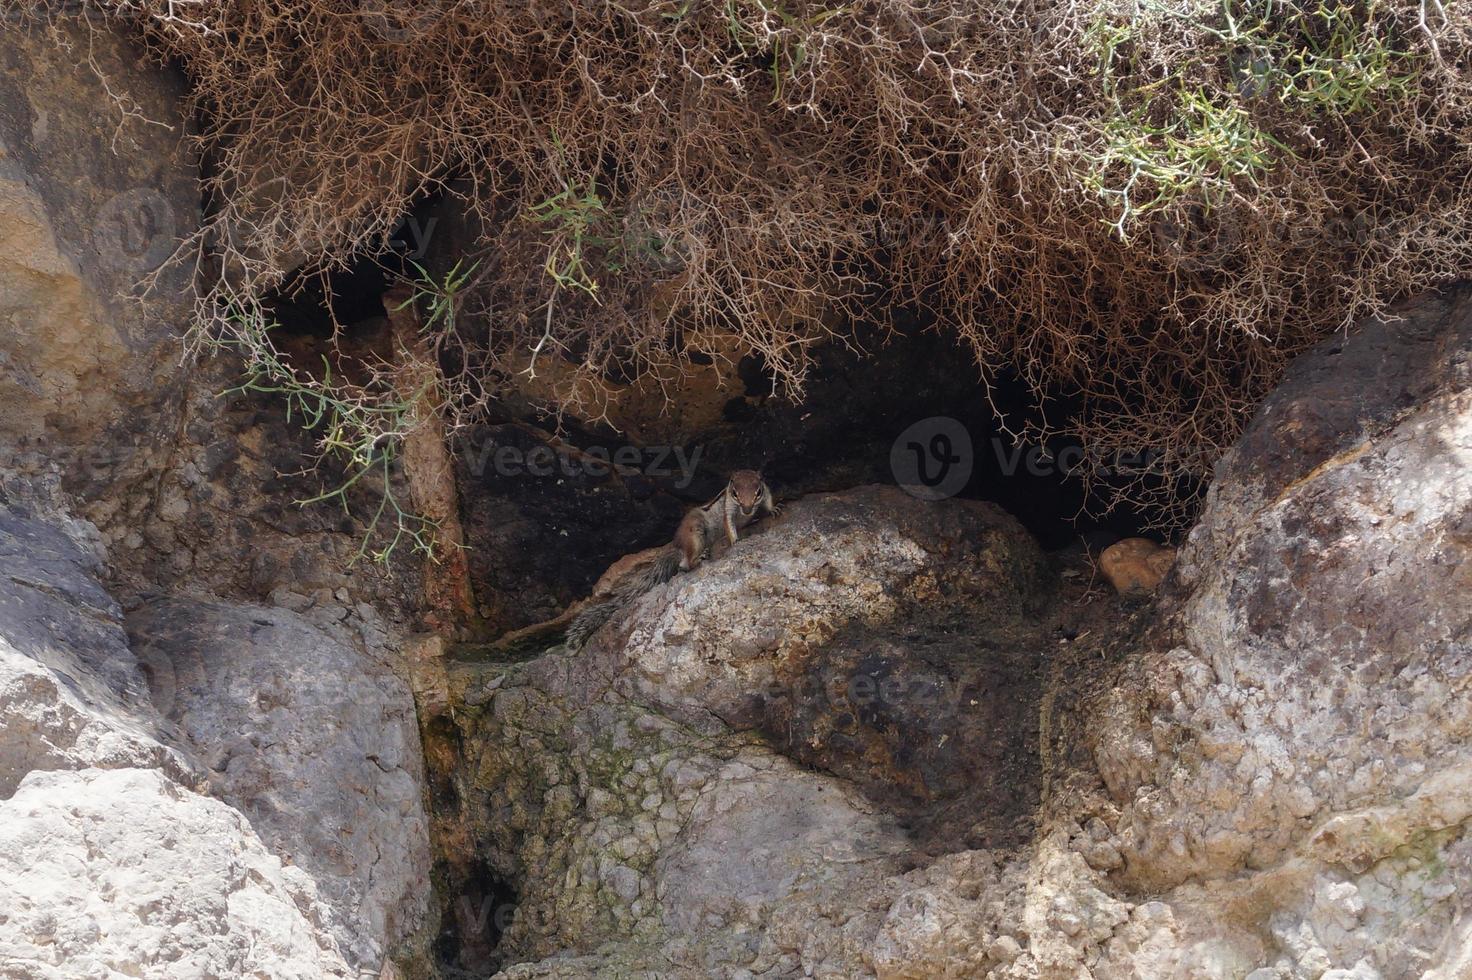 Barbary Ground Squirrel photo